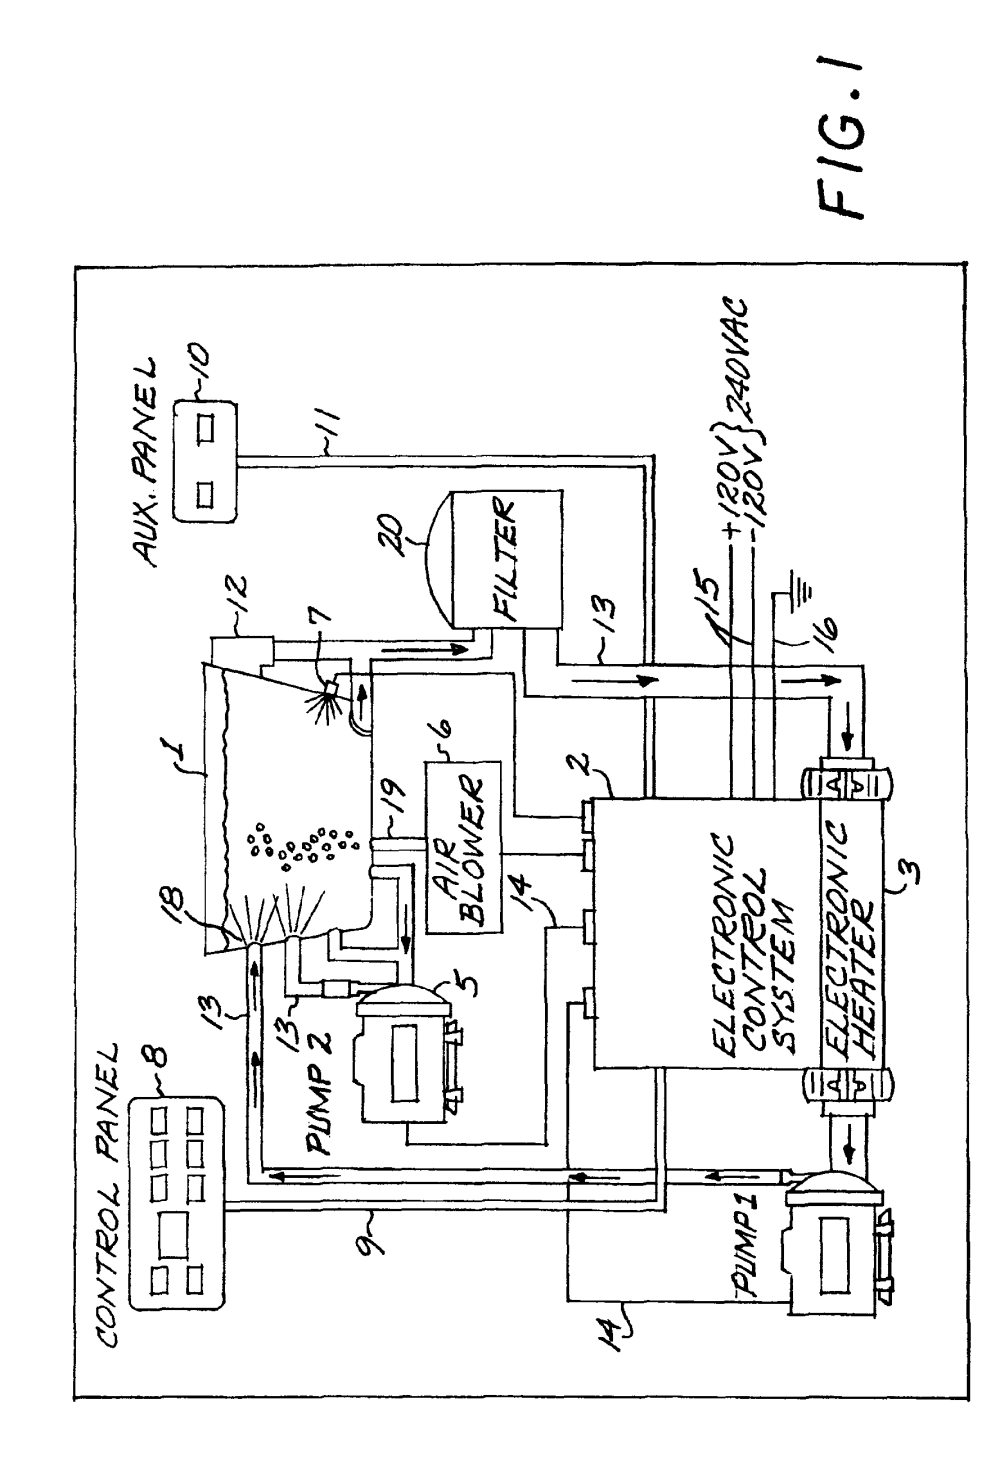 medium resolution of caldera wiring diagram wiring library 2002 cal spa wiring diagram auto today